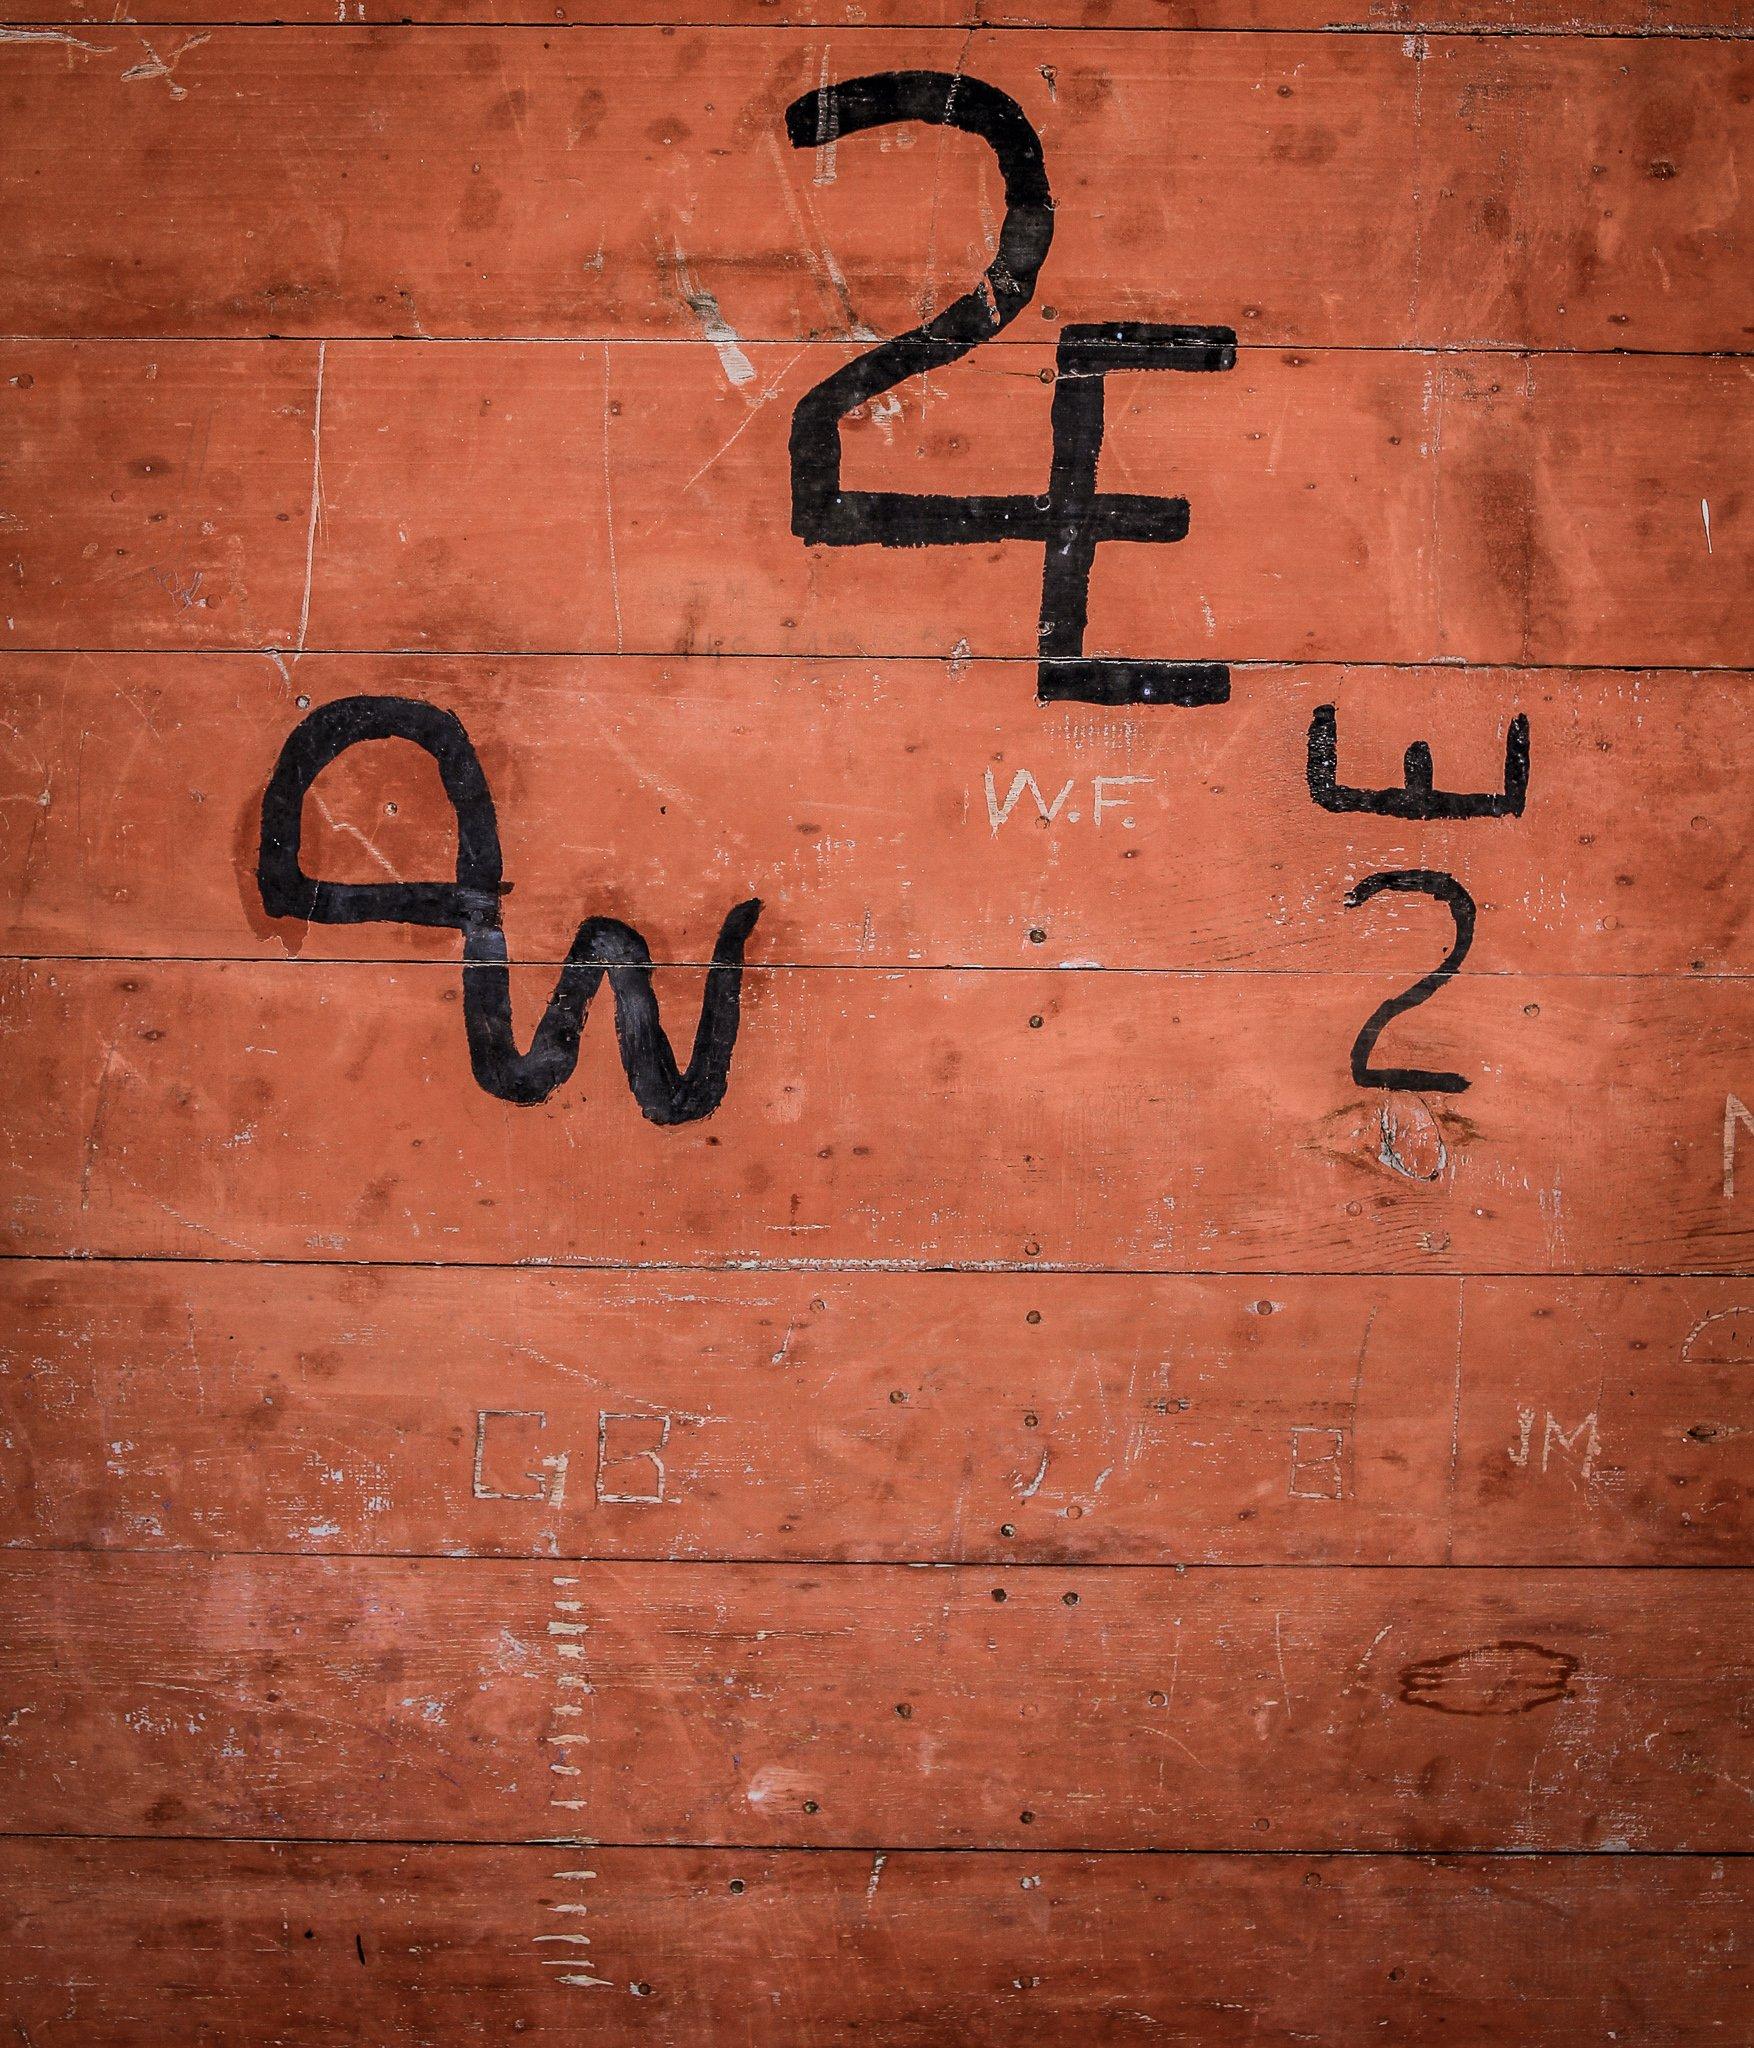 Initials on the HIstoric Barn door